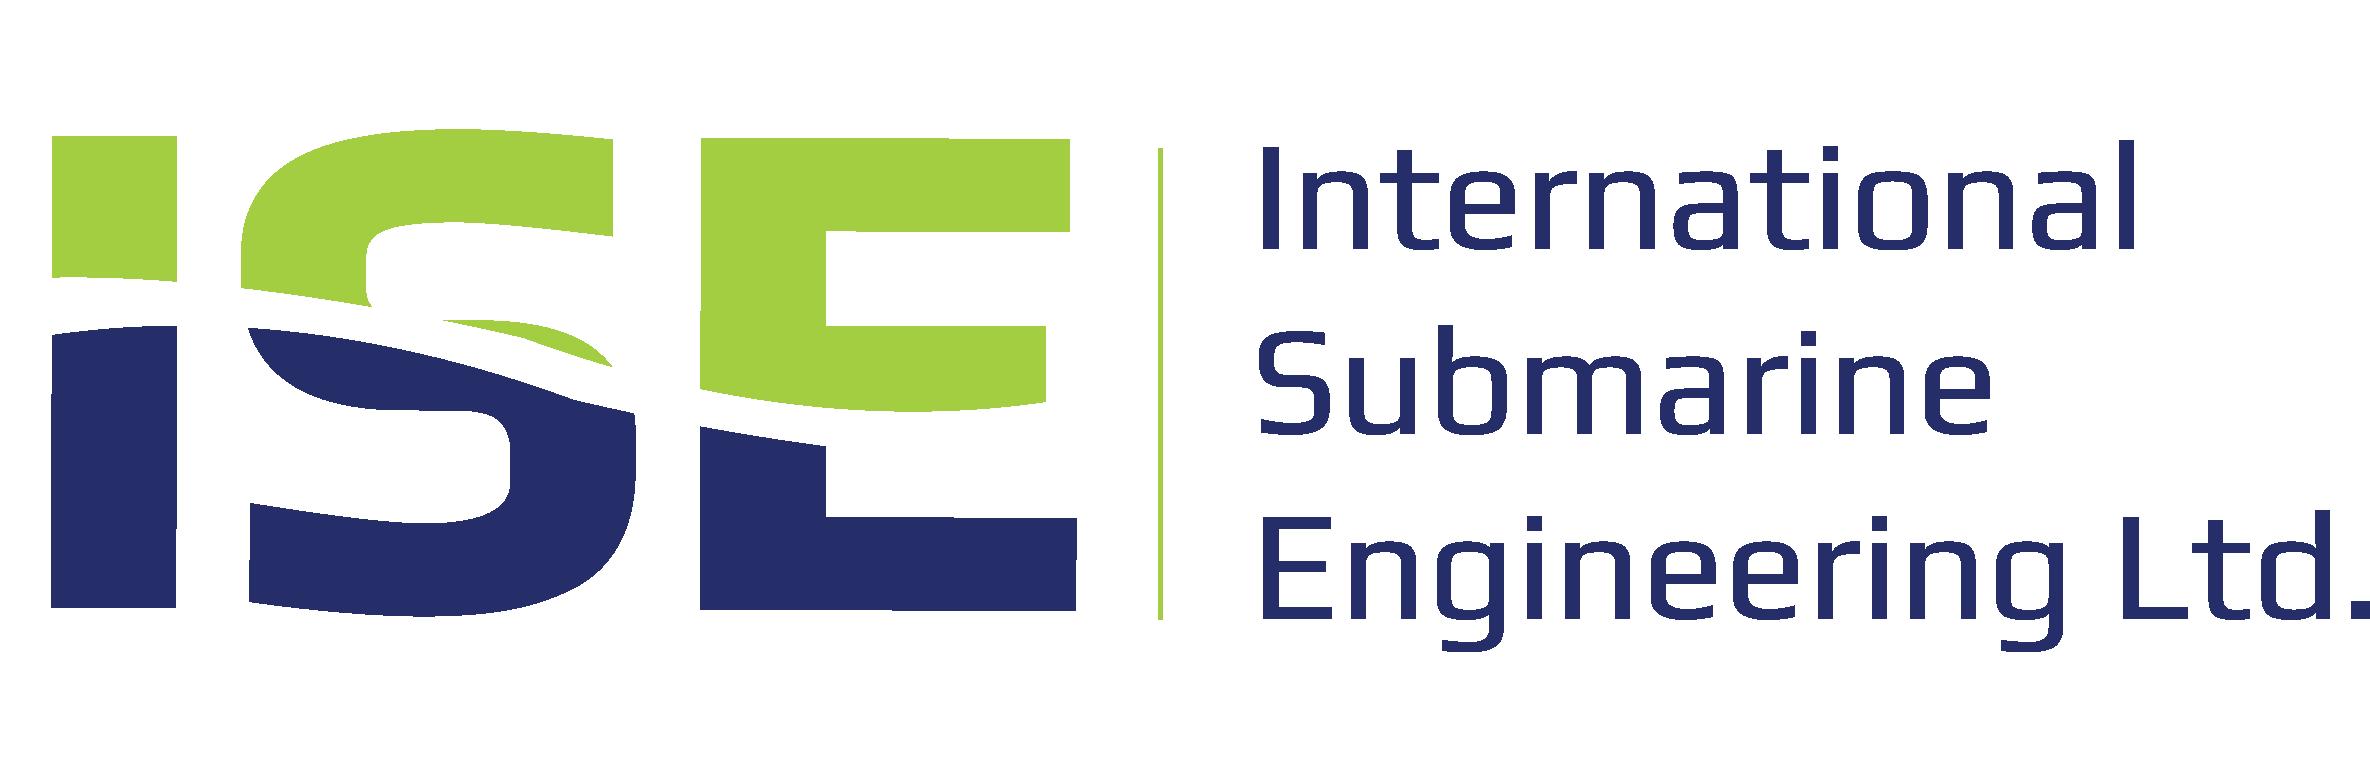 ISE_AUV_ROV_Robotics Logo